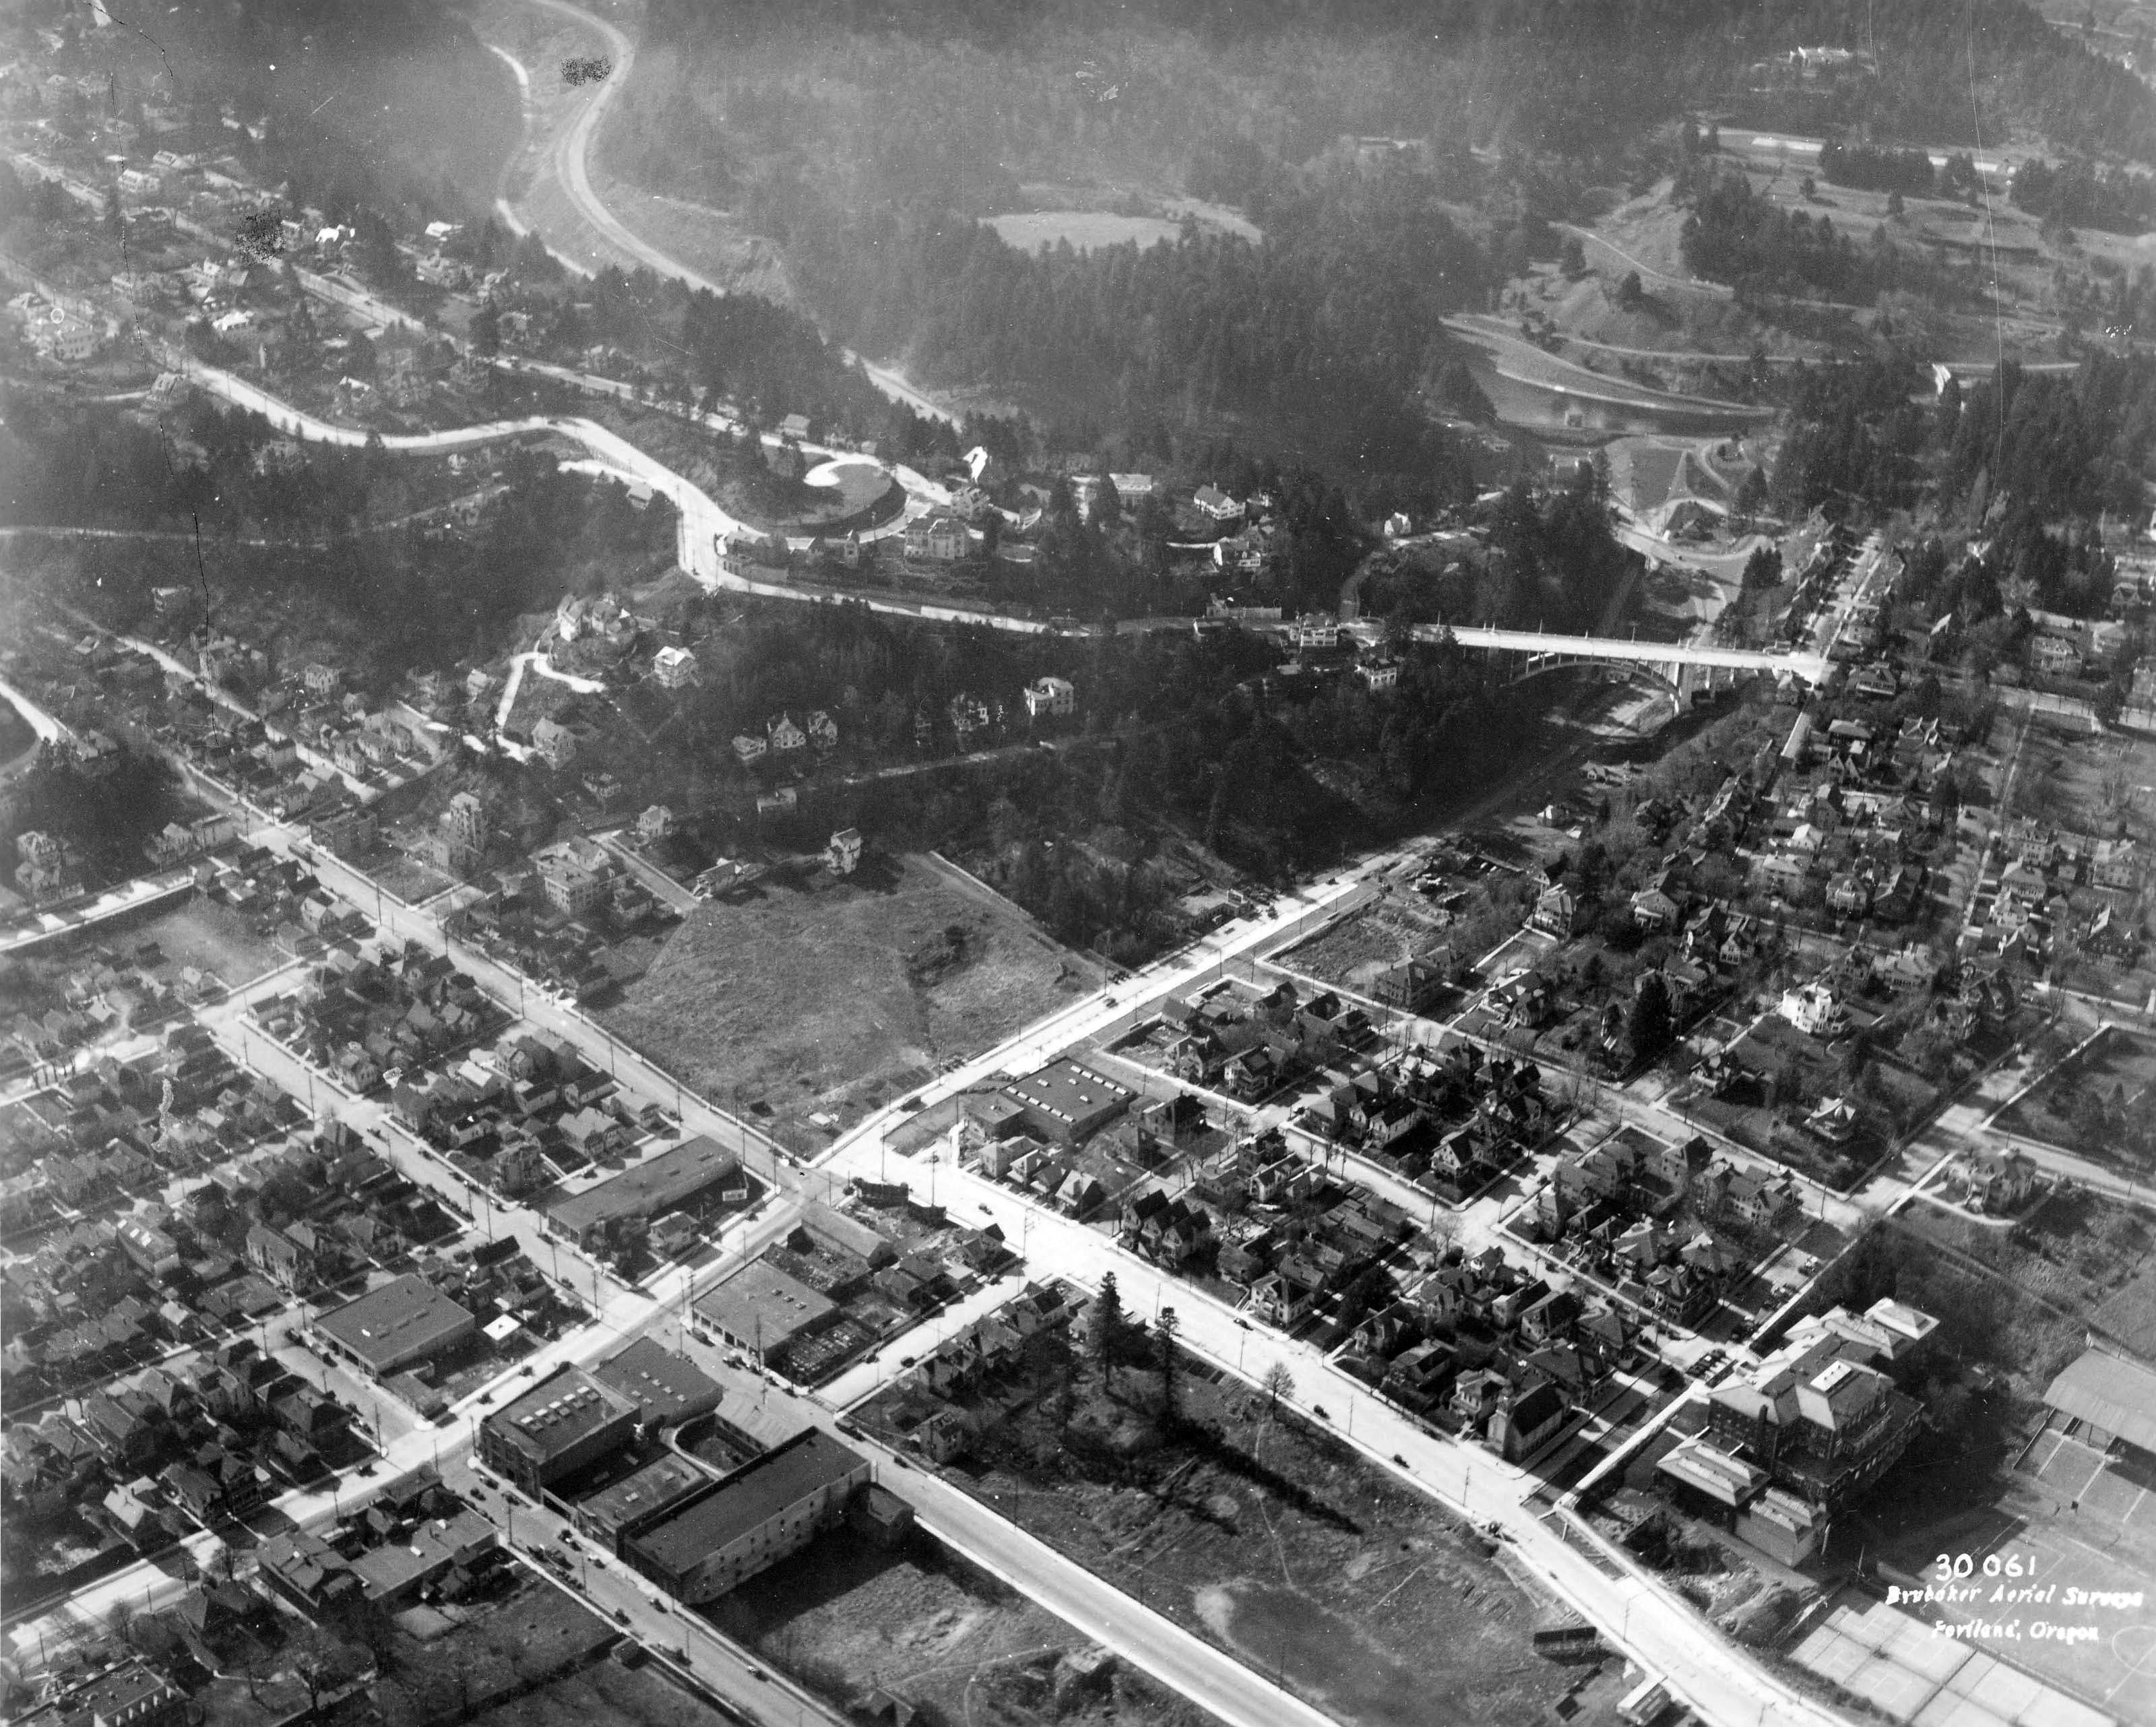 A1999-004.51 Aerial view of SW Portland near the Vista Bridge 1932